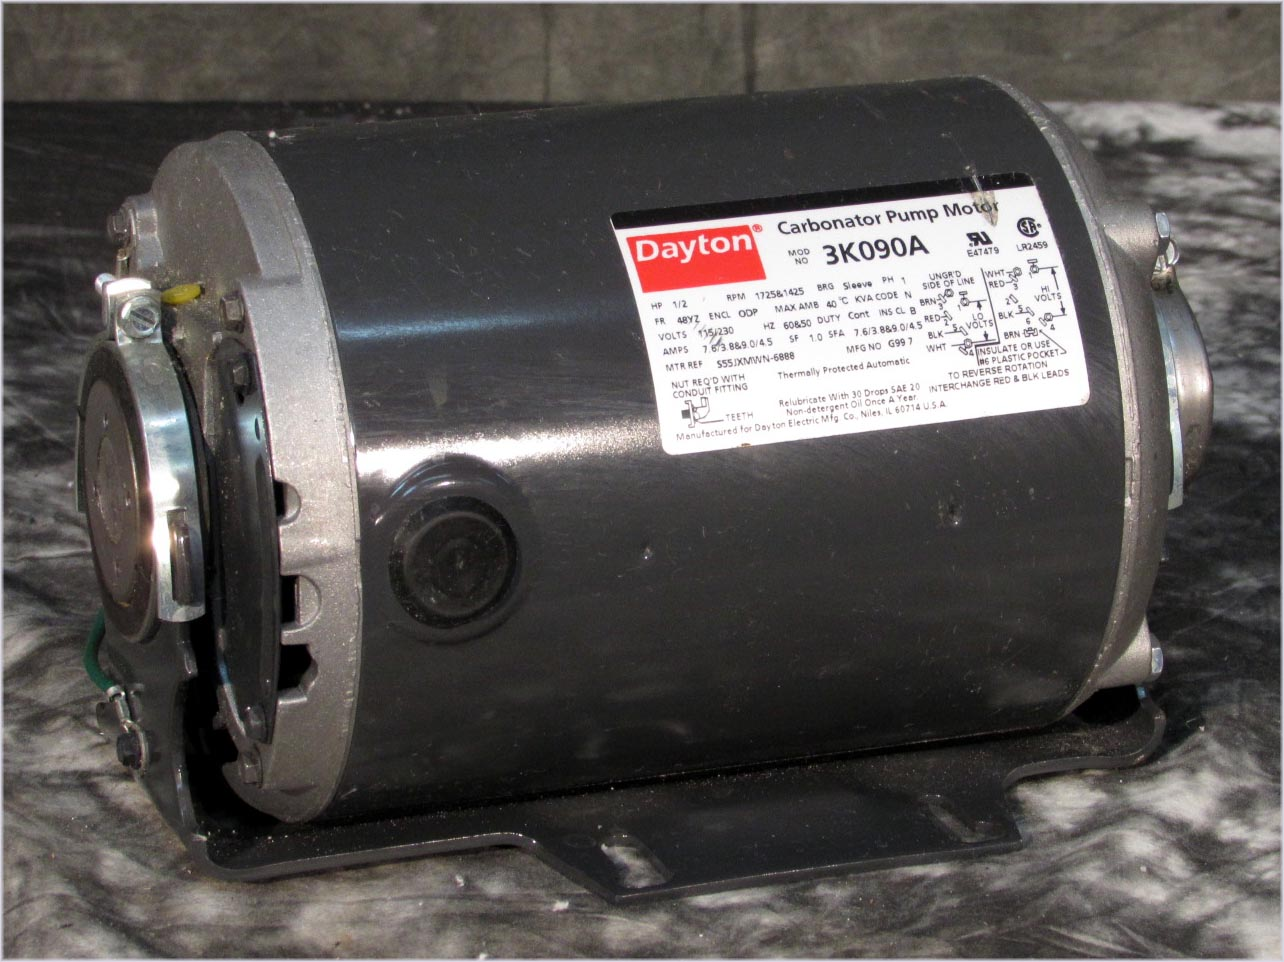 Dayton 3k090a Carbonator Pump Motor Teel 2p386 A 1 2hp